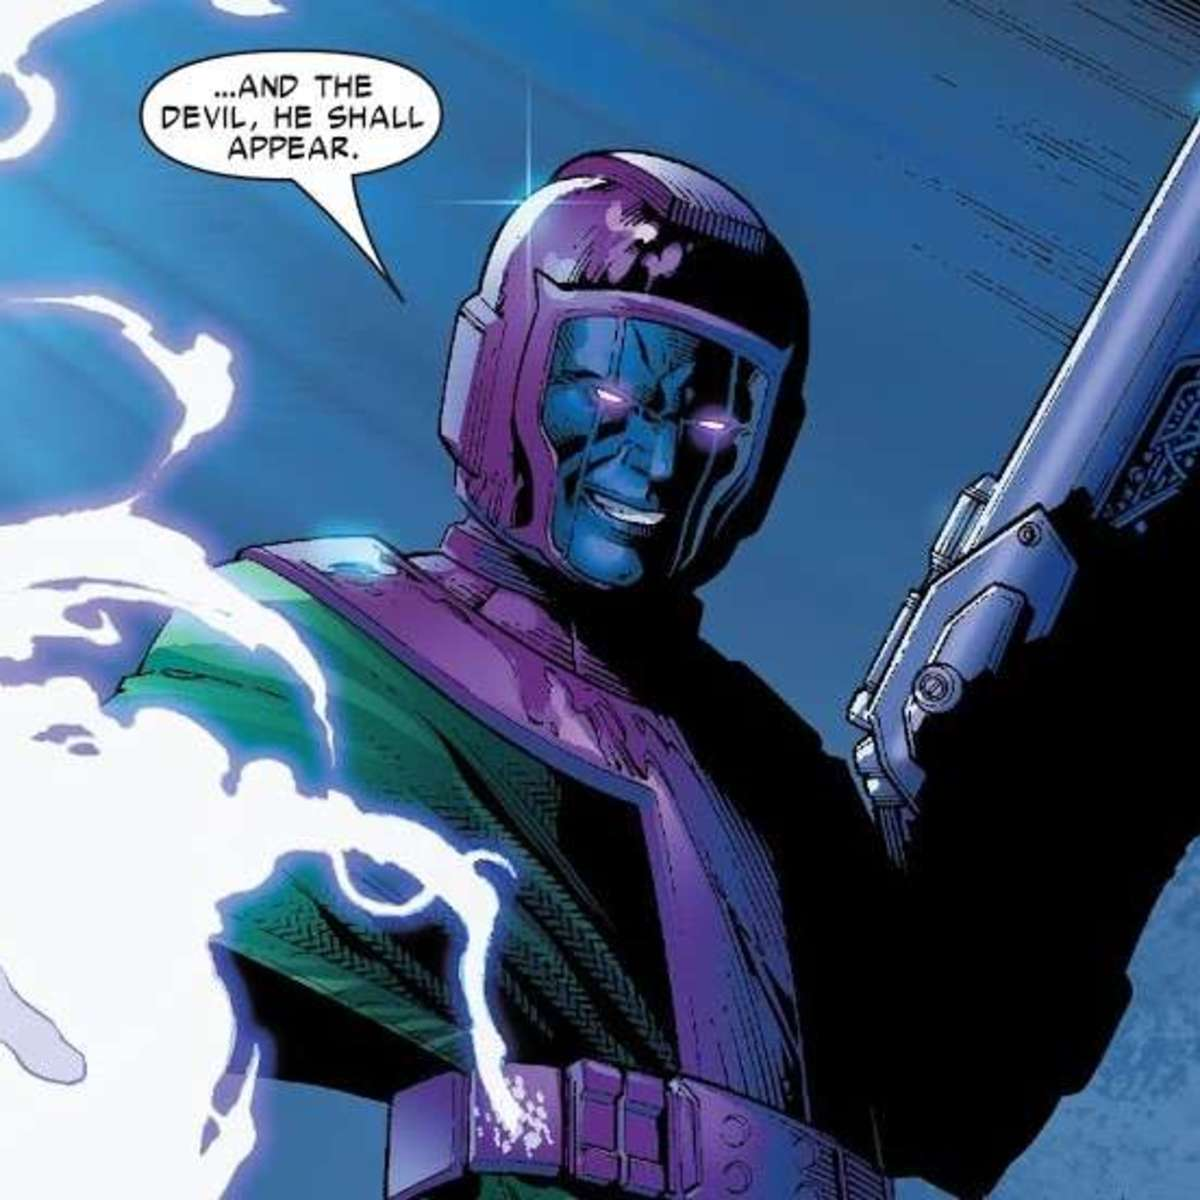 Young Avengers #3 ( Writer Allan Heinberg, Penciler Jim Cheung) [Credit: Marvel Comics]